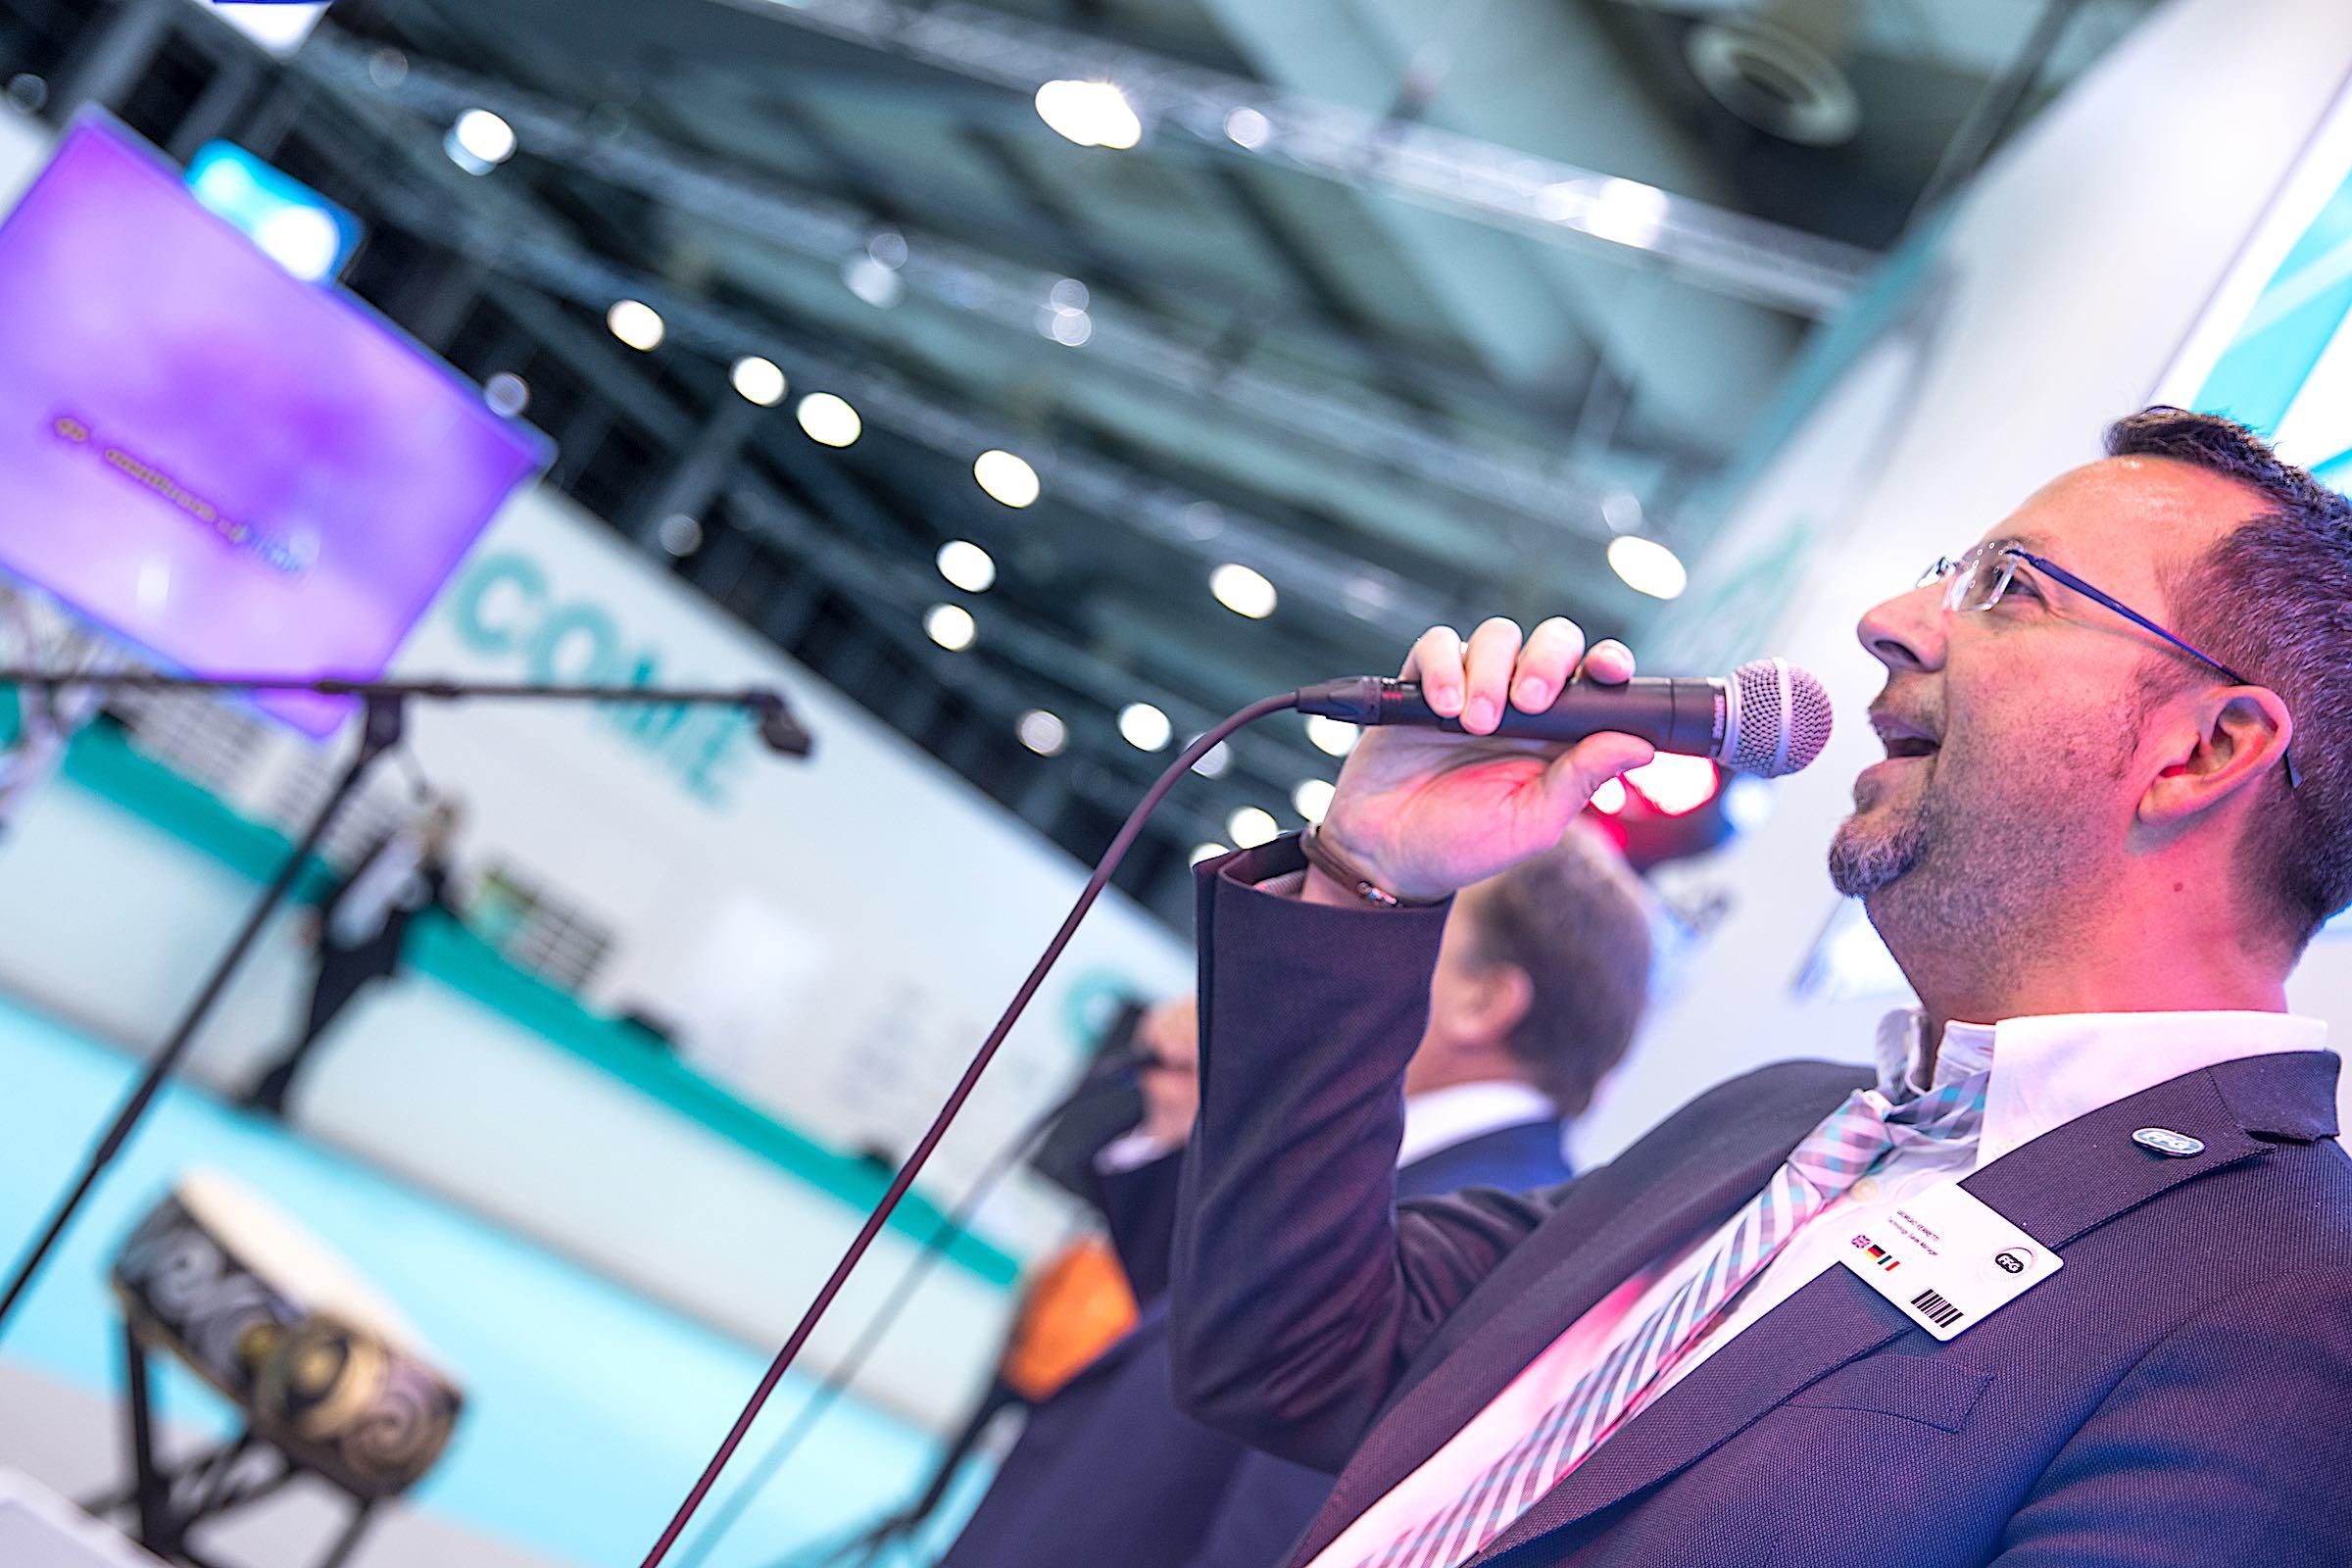 Karaoke | Maschine | Karaoke | Automat | Karaoke | Anlage | Karaokeanlage | Technik | Karaoke | Songs | Karaoke | Gerät | Leihen | Buchen | Mieten | Lehmann | Eventservice | Hannover